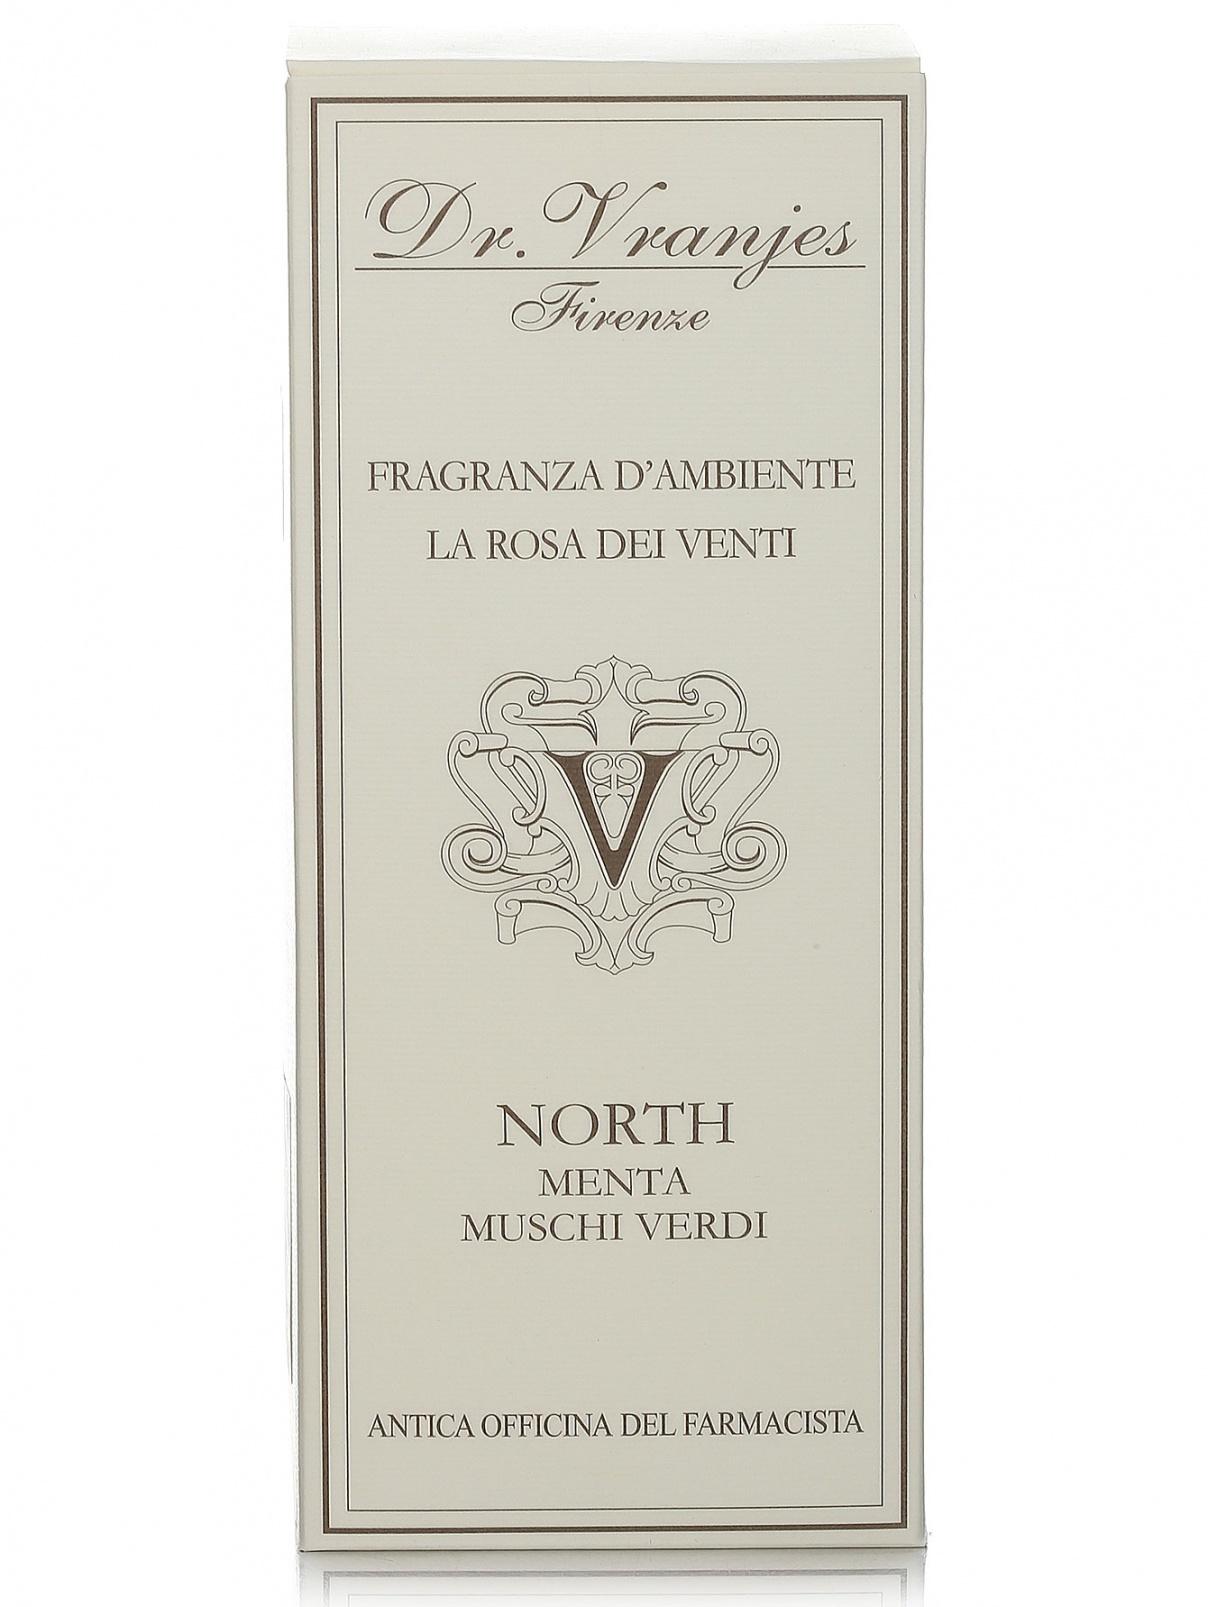 Ароматизатор воздуха North - Home Fragrance, 250ml Dr. Vranjes  –  Модель Общий вид